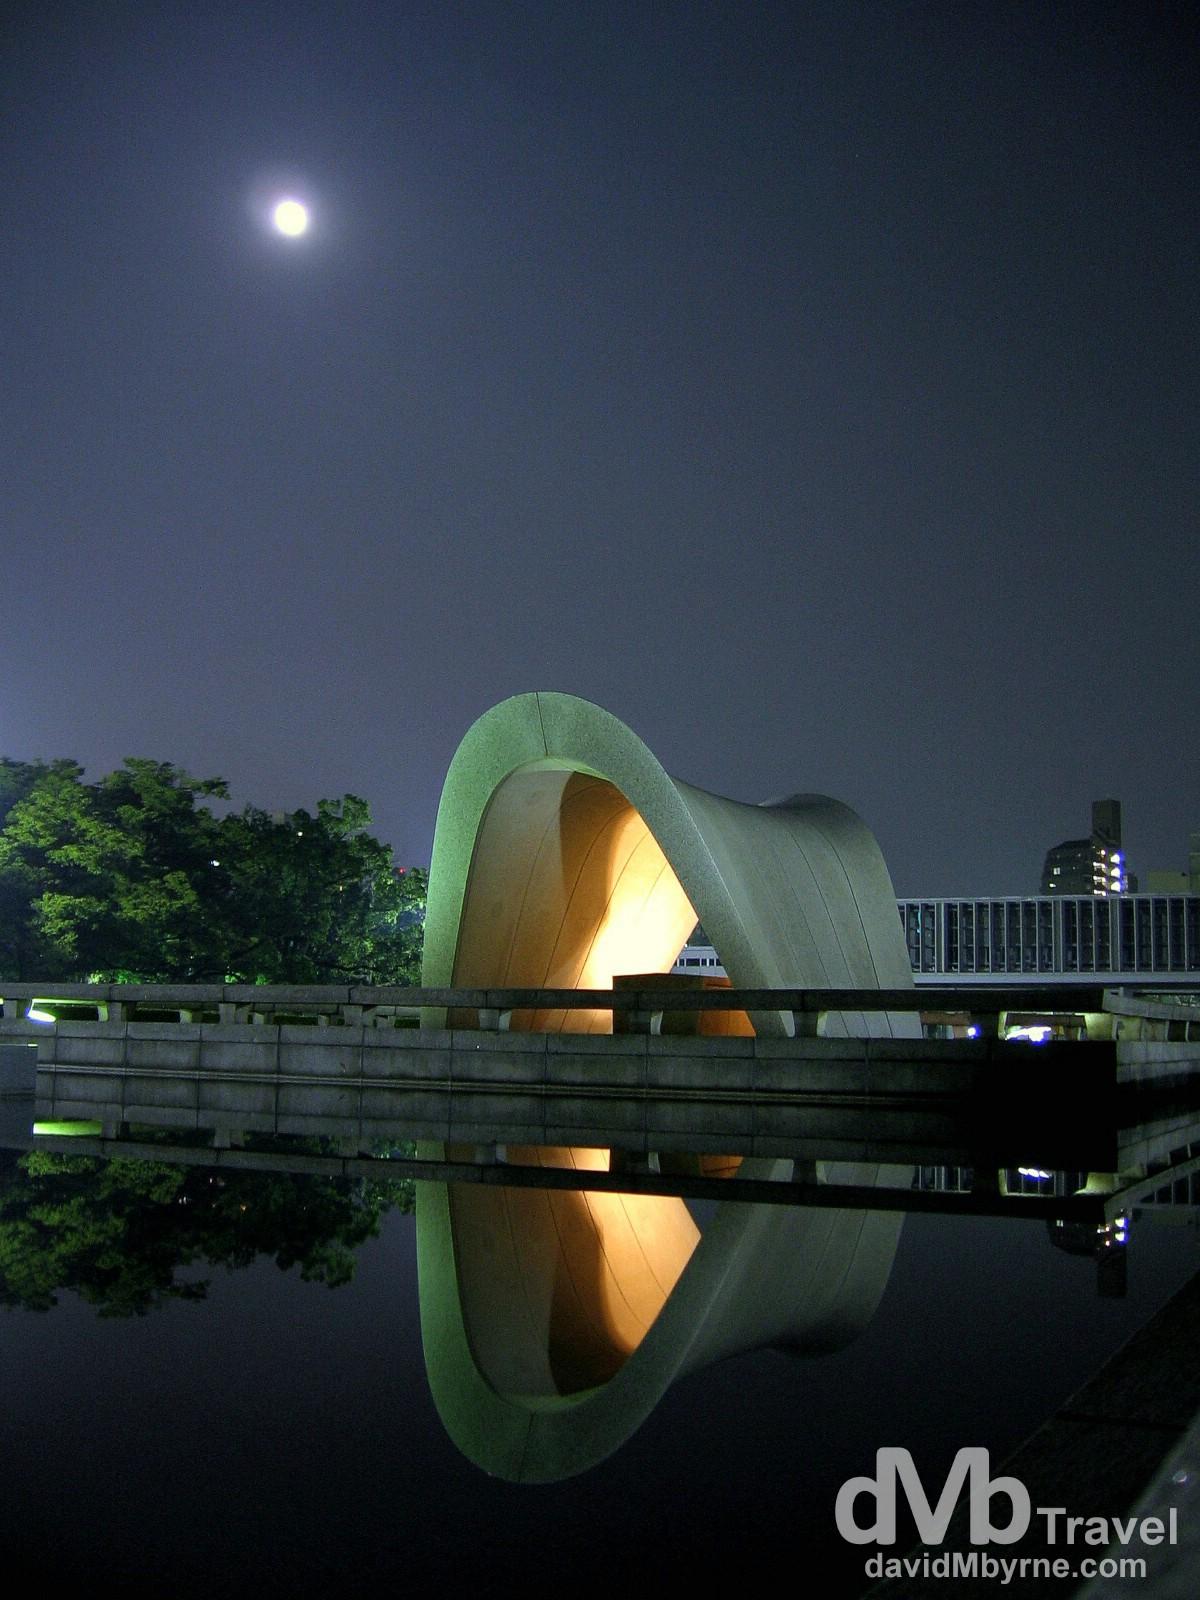 Reflections of the Memorial Cenotaph in Hiroshima Peace Memorial Park, Hiroshima, Japan. July 22nd 2005.